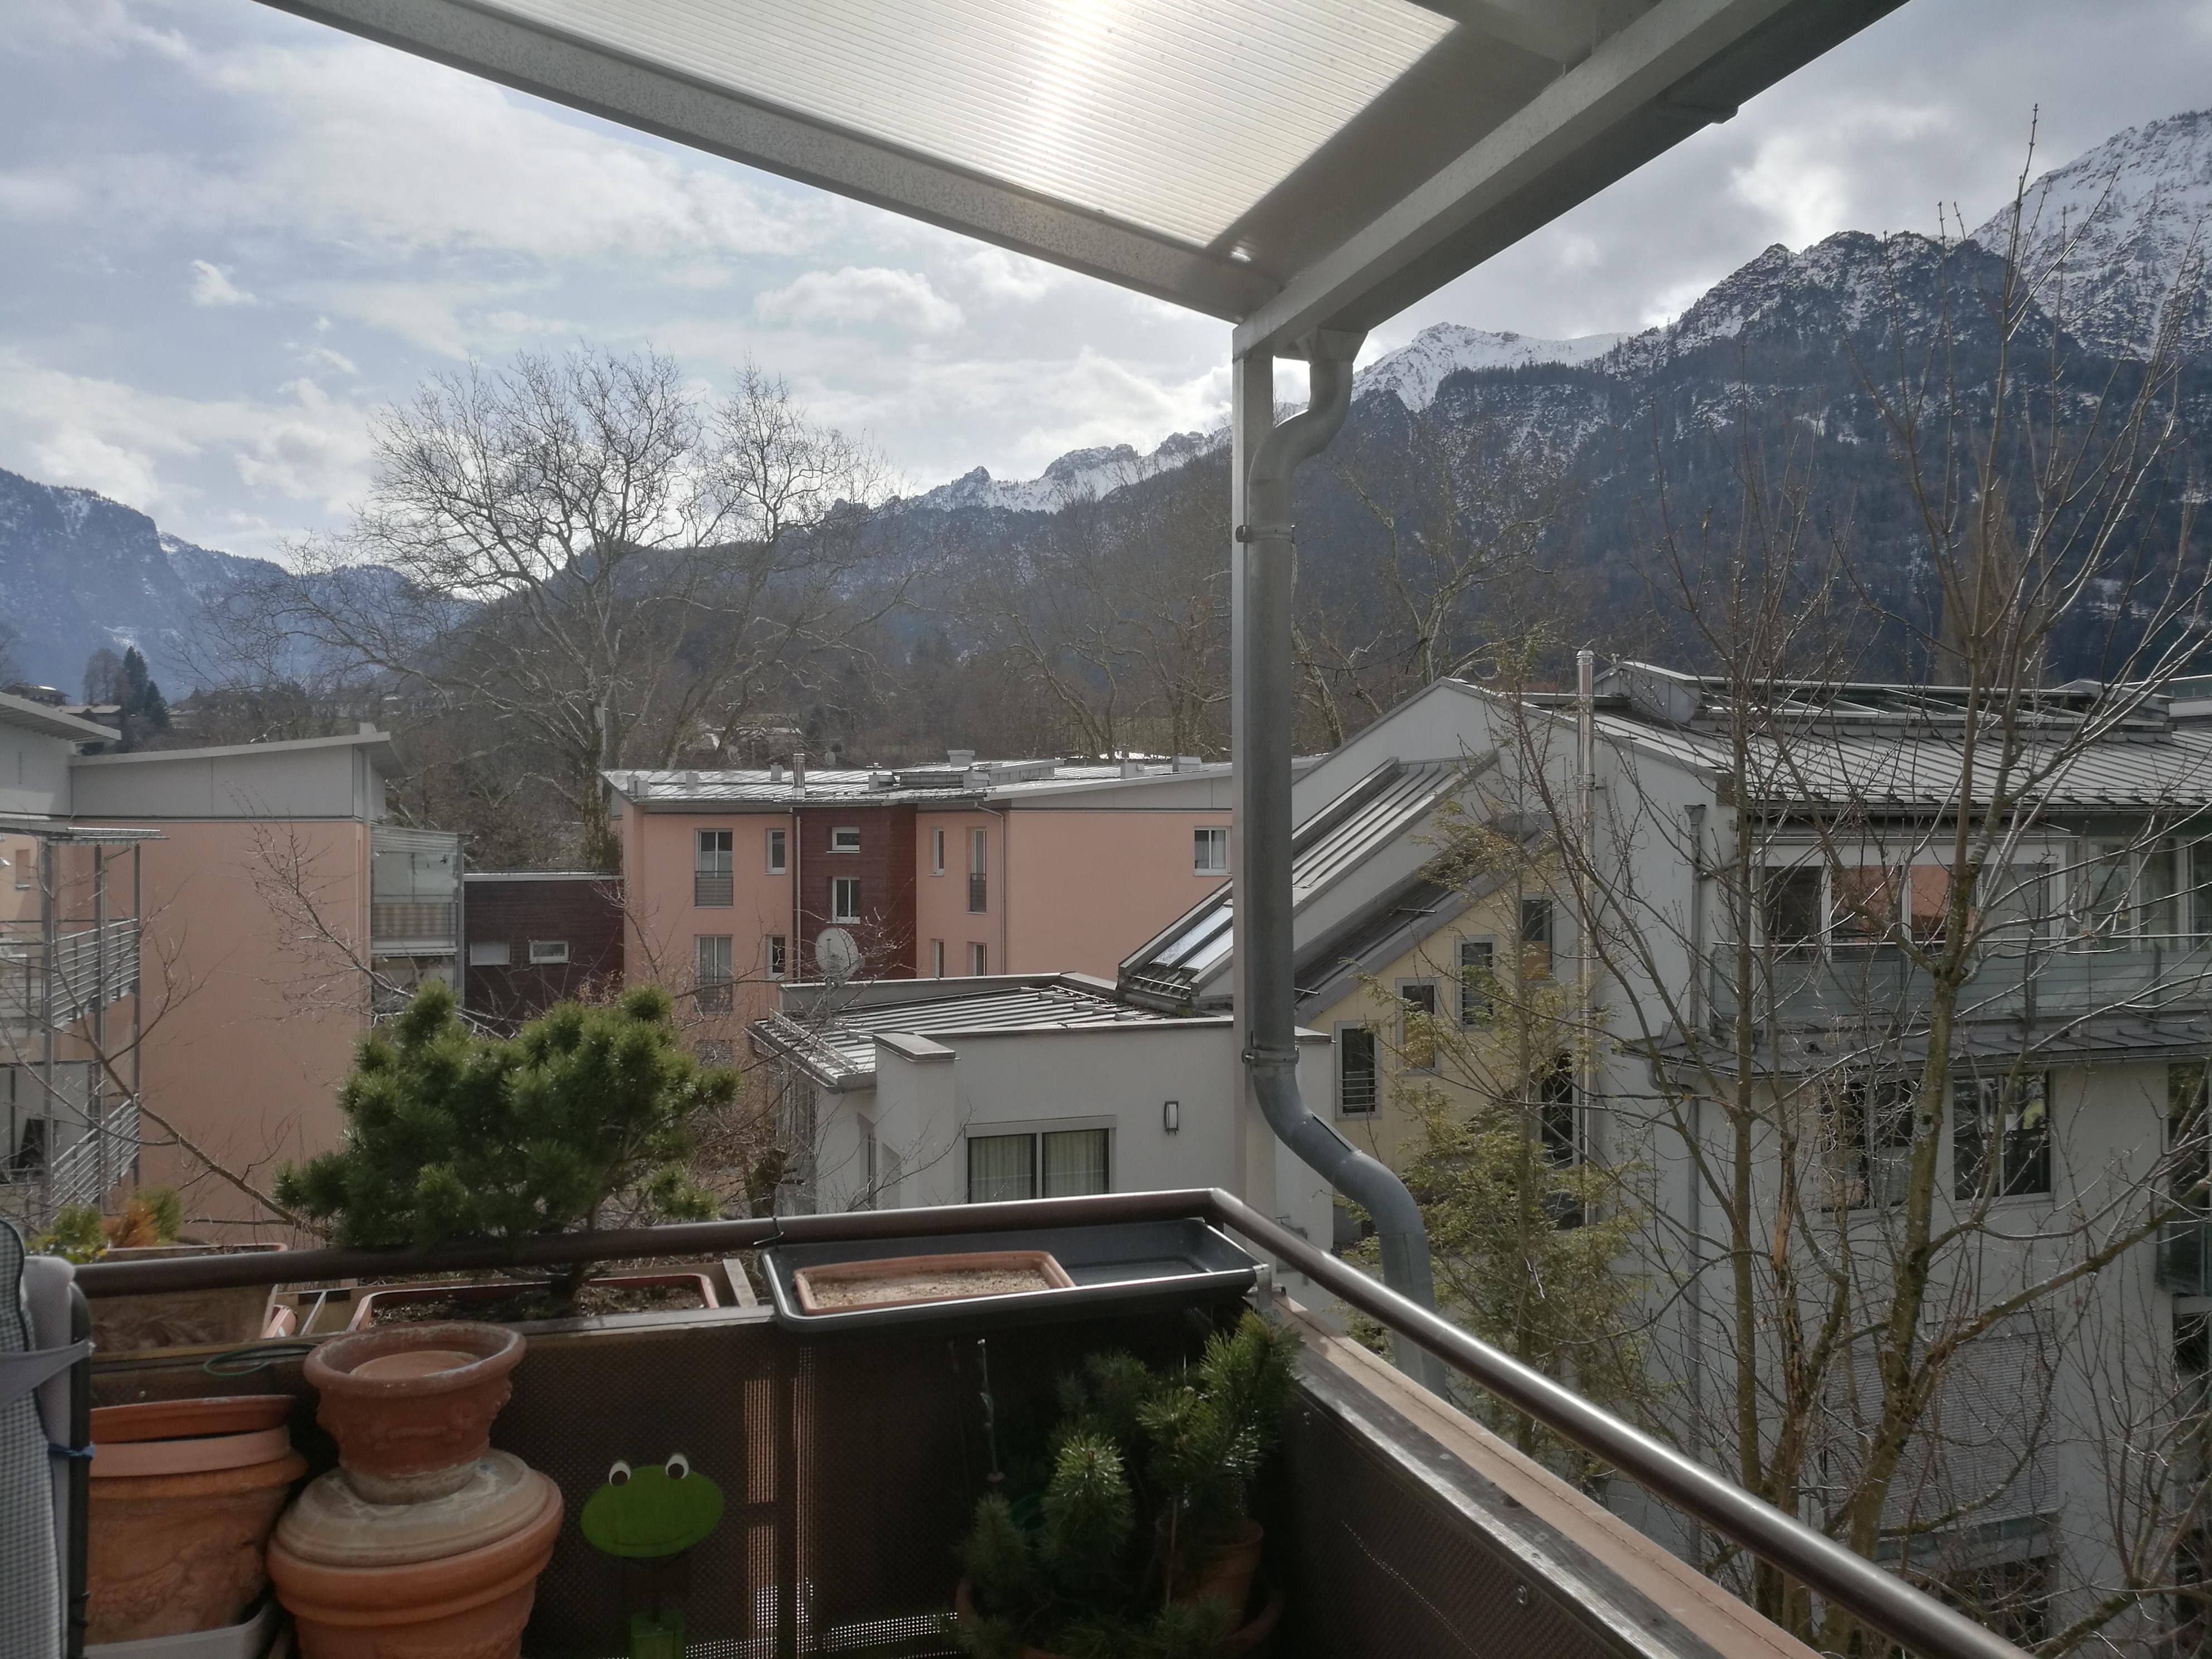 bad reichenhall 3 zimmer whg mit ca 12m sonnenloggia mit bergblick petrovic immobilien. Black Bedroom Furniture Sets. Home Design Ideas